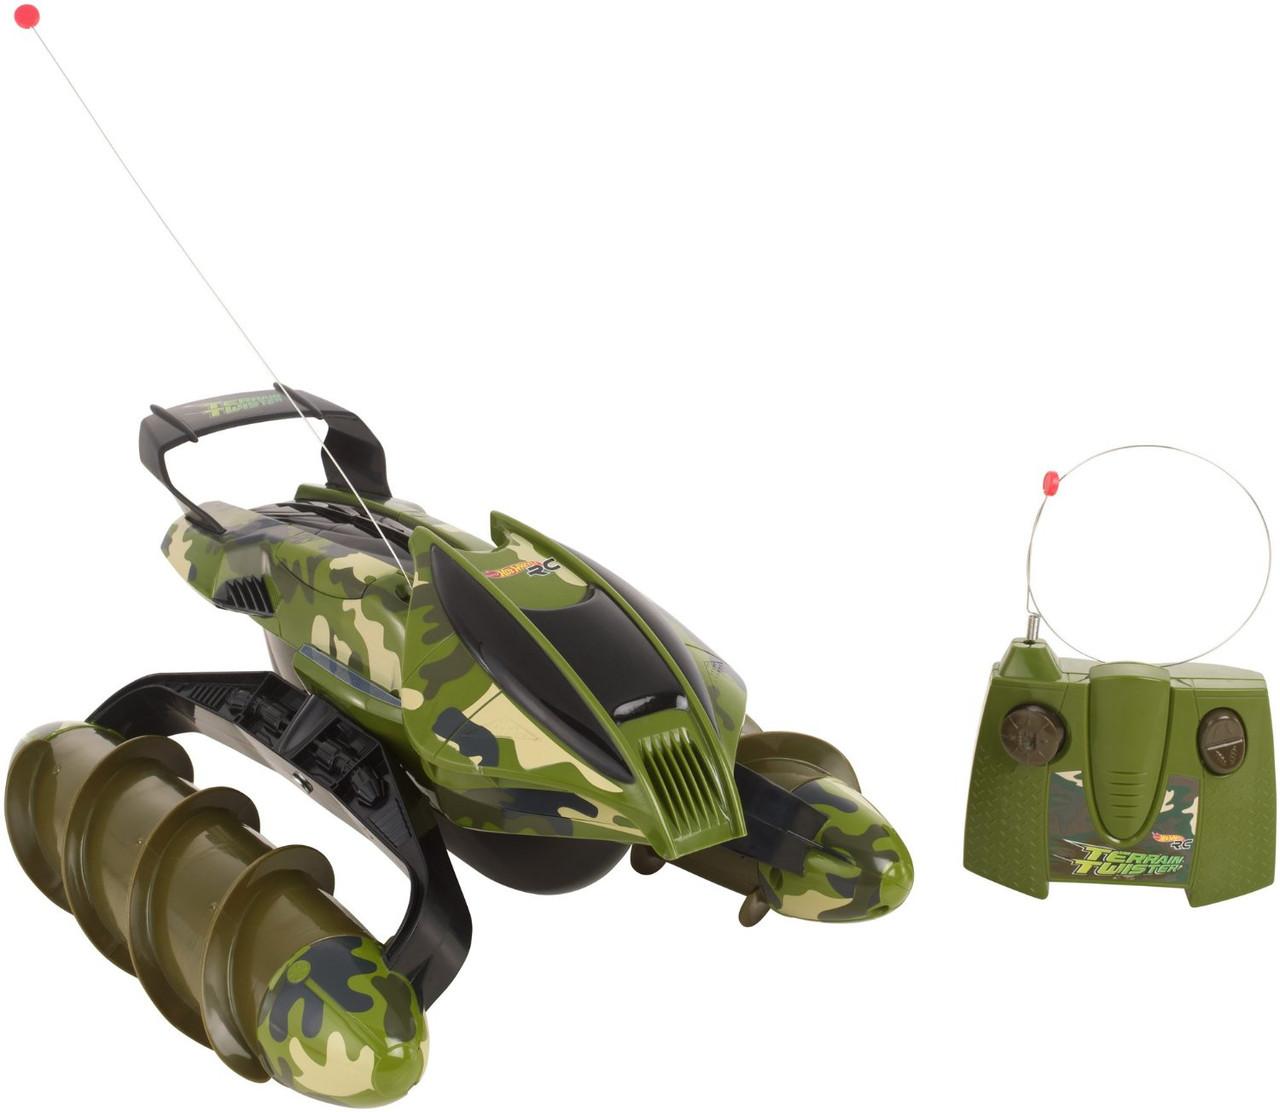 Hot Wheels Вездеход на р/у камуфляжный RC Terrain Twister Camo Mattel 04779